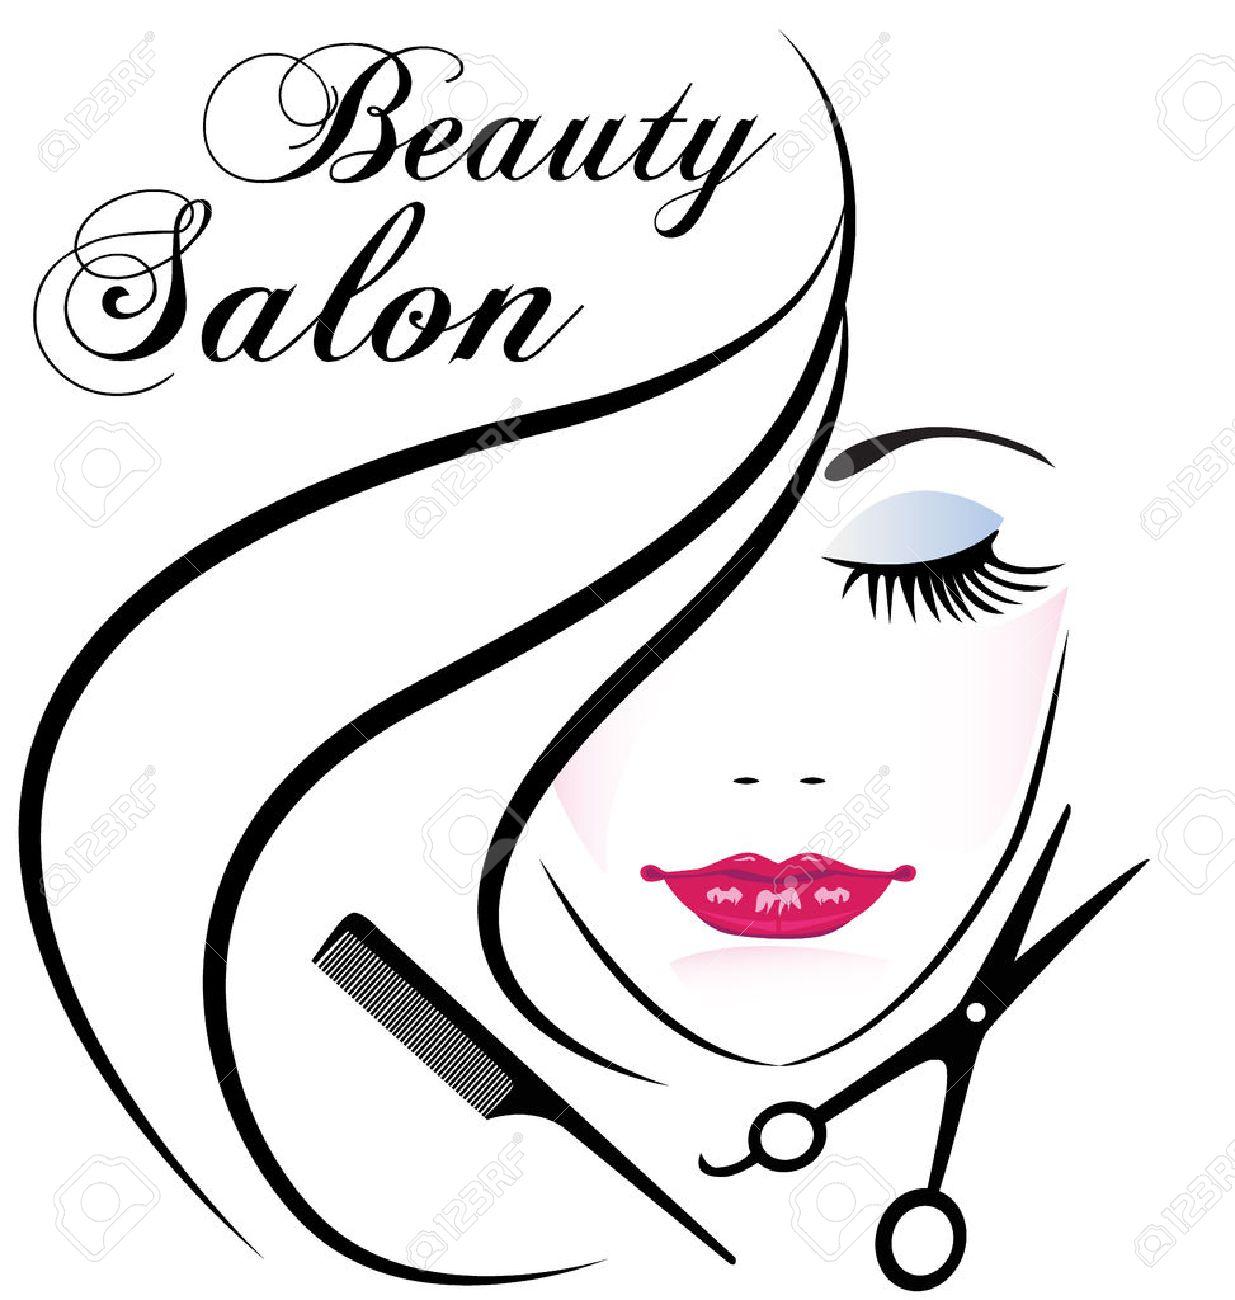 Beauty salon pretty woman hair face comb and scissors logo vector design - 68645764